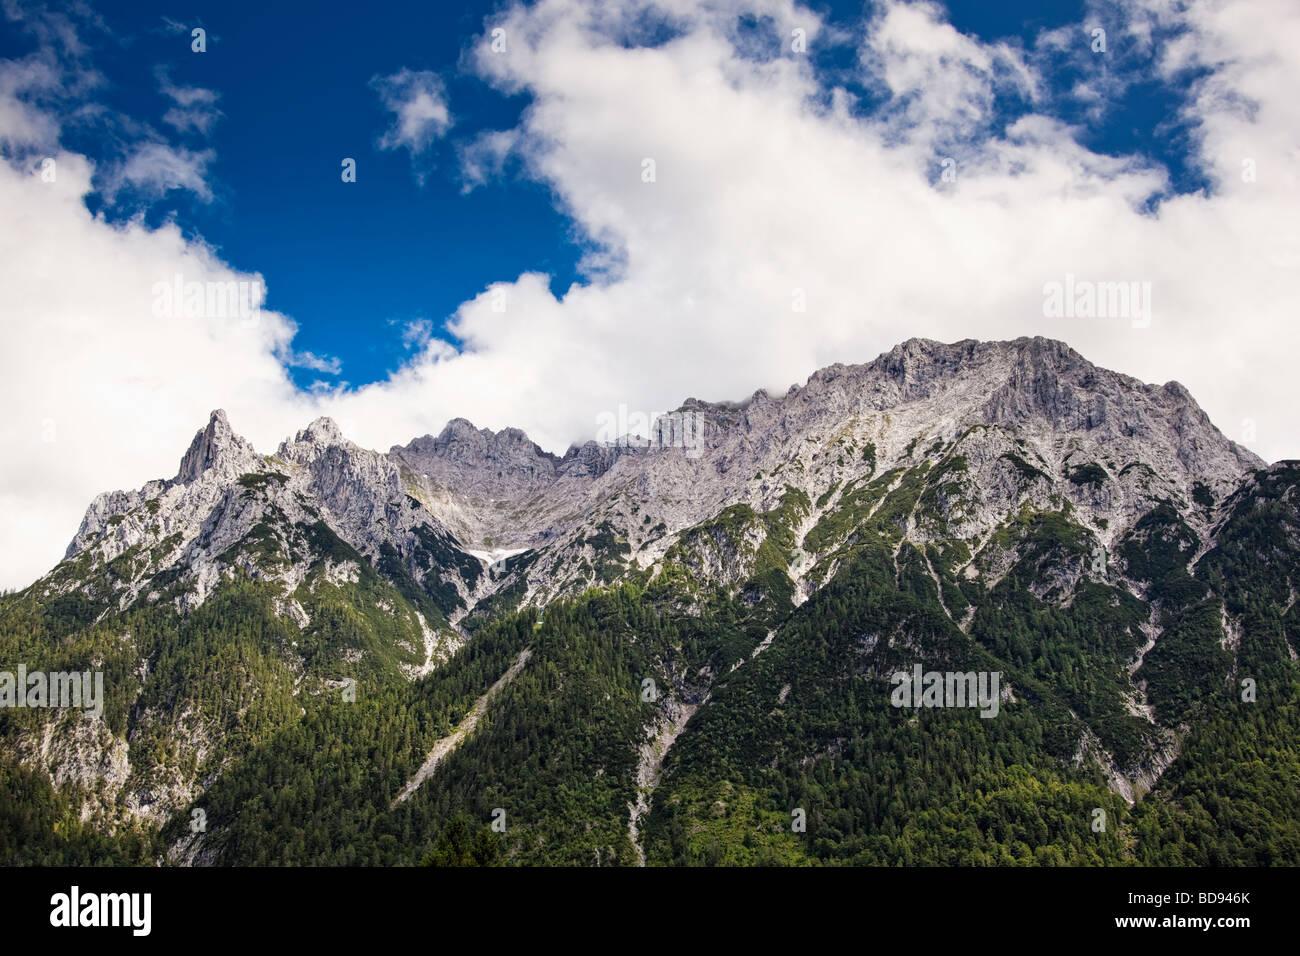 Viererspitze and the Karwendel mountain range Bavaria Germany Europe - Stock Image